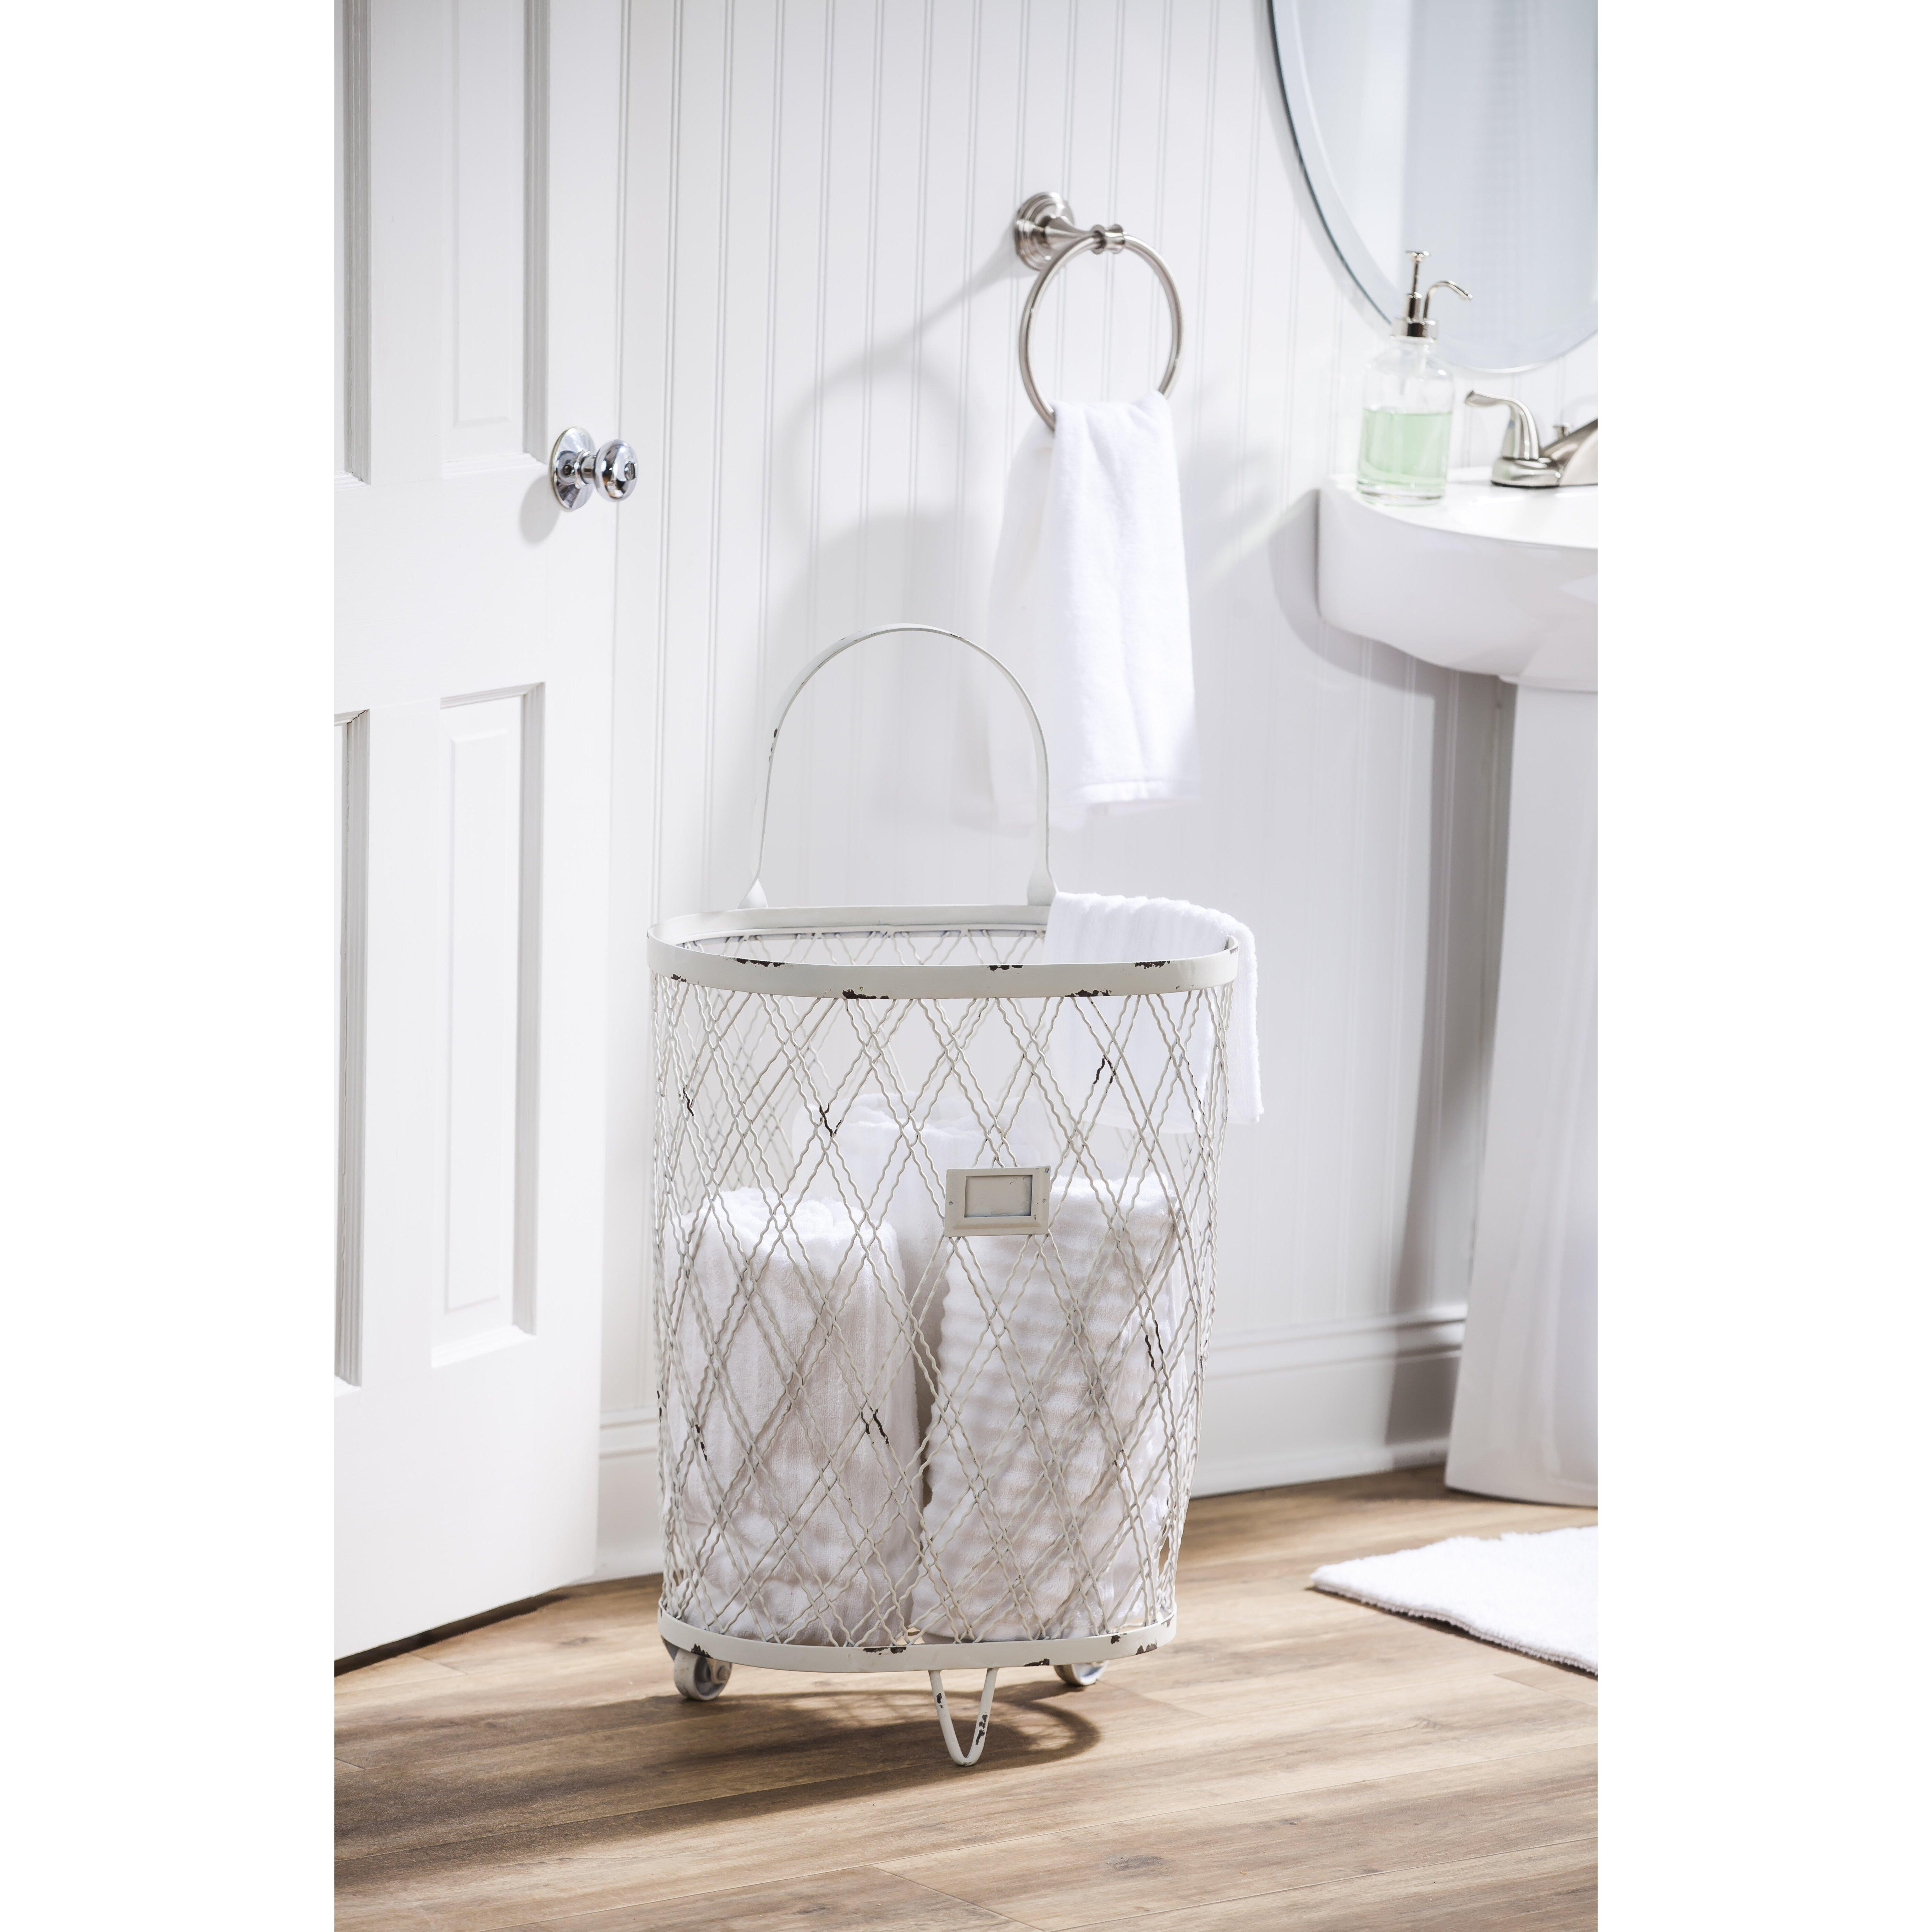 Evergreen enterprises inc vintage storage basket on - Bathroom storage on wheels ...